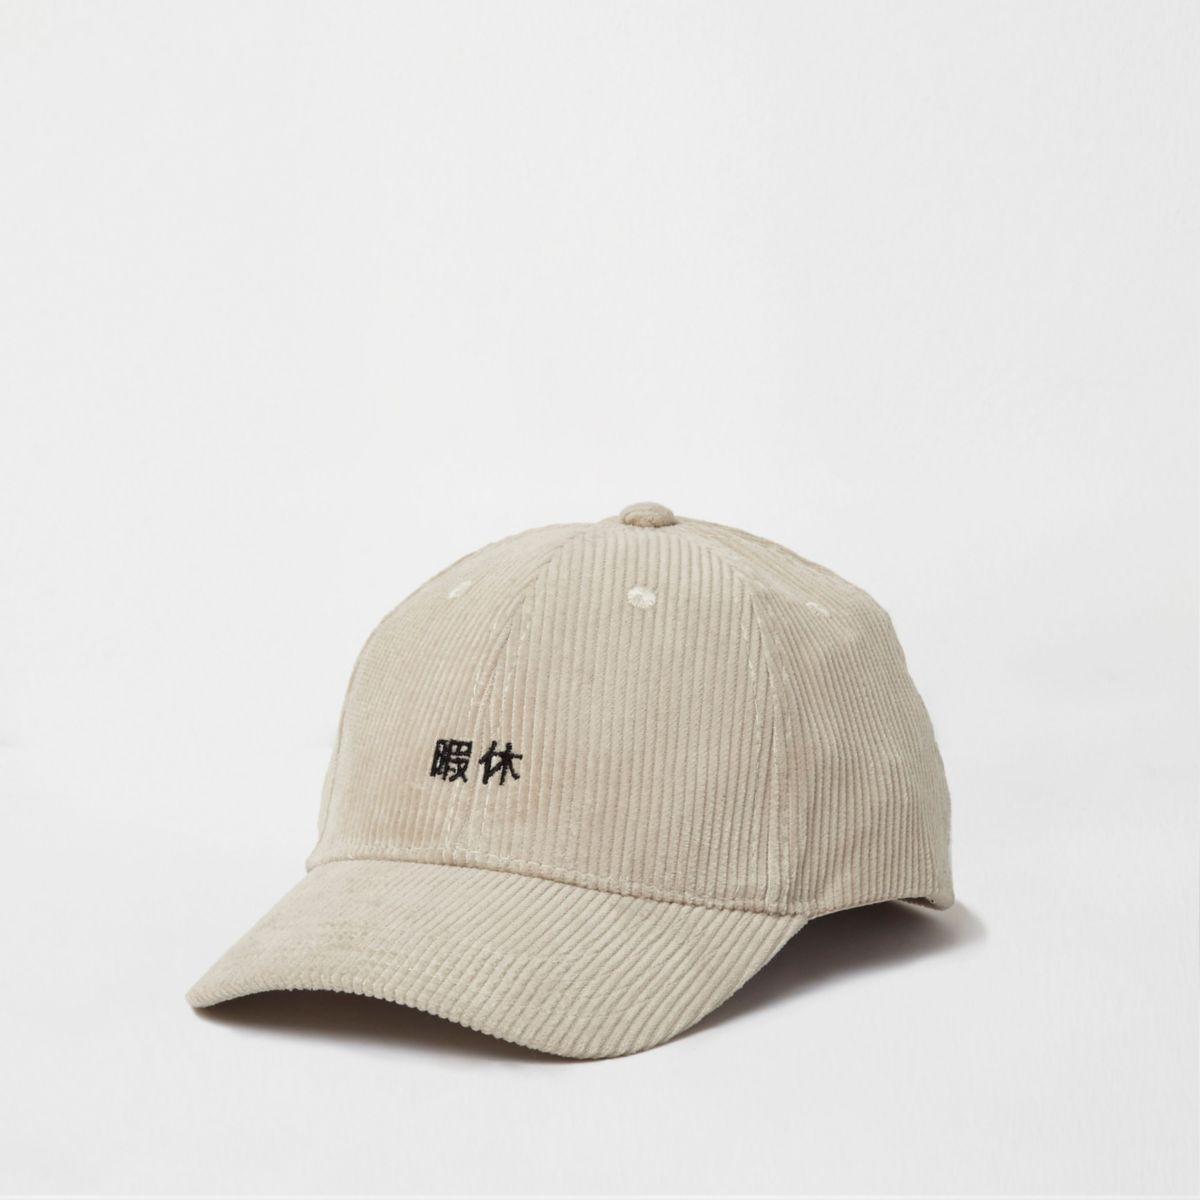 Cream cord embroidered baseball cap